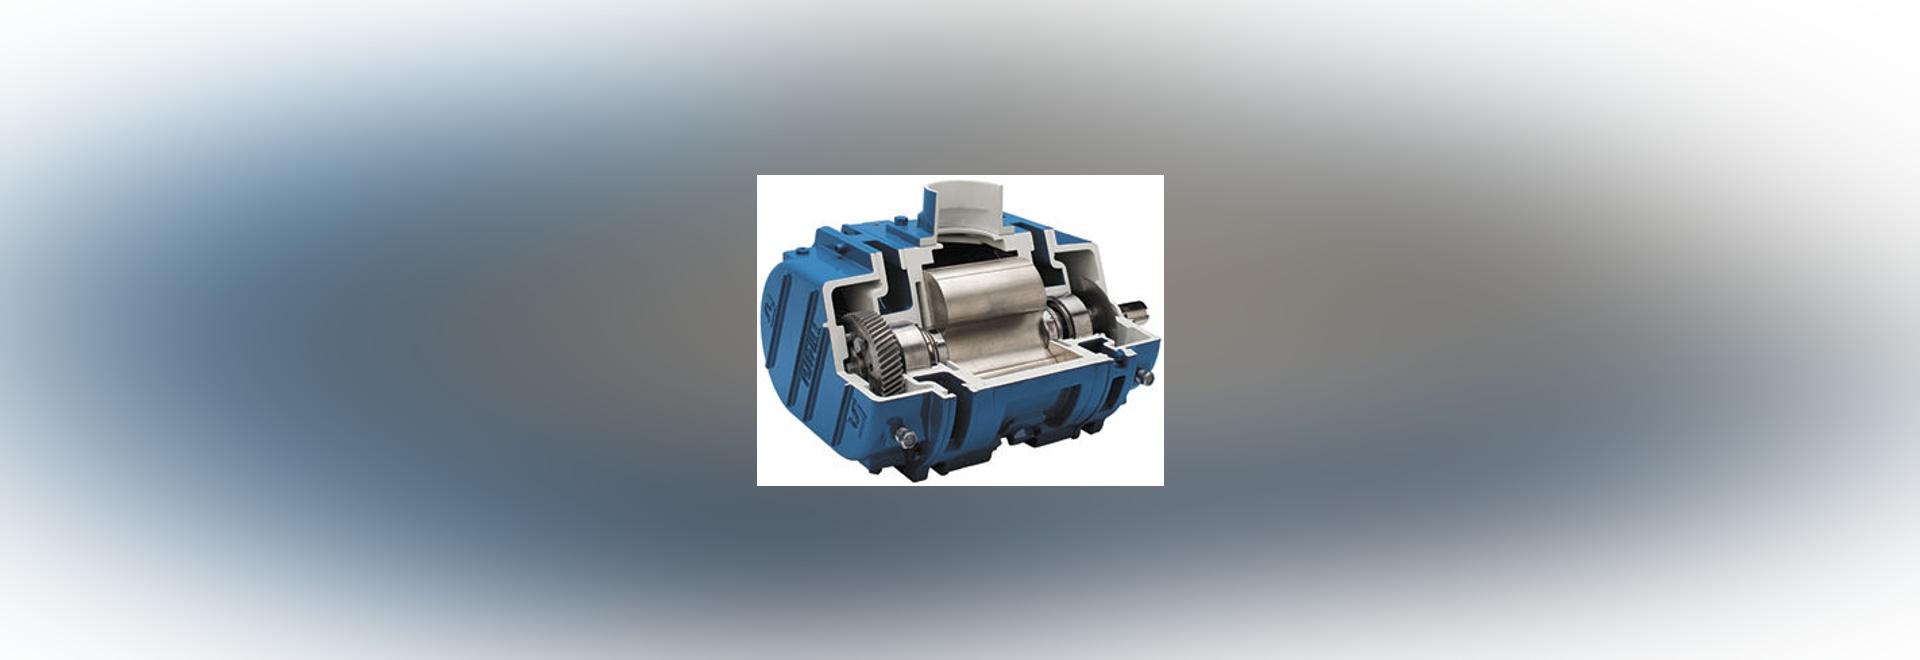 NEU: Luftgebläse durch Tuthill Vacuum u. Gebläse-Systeme